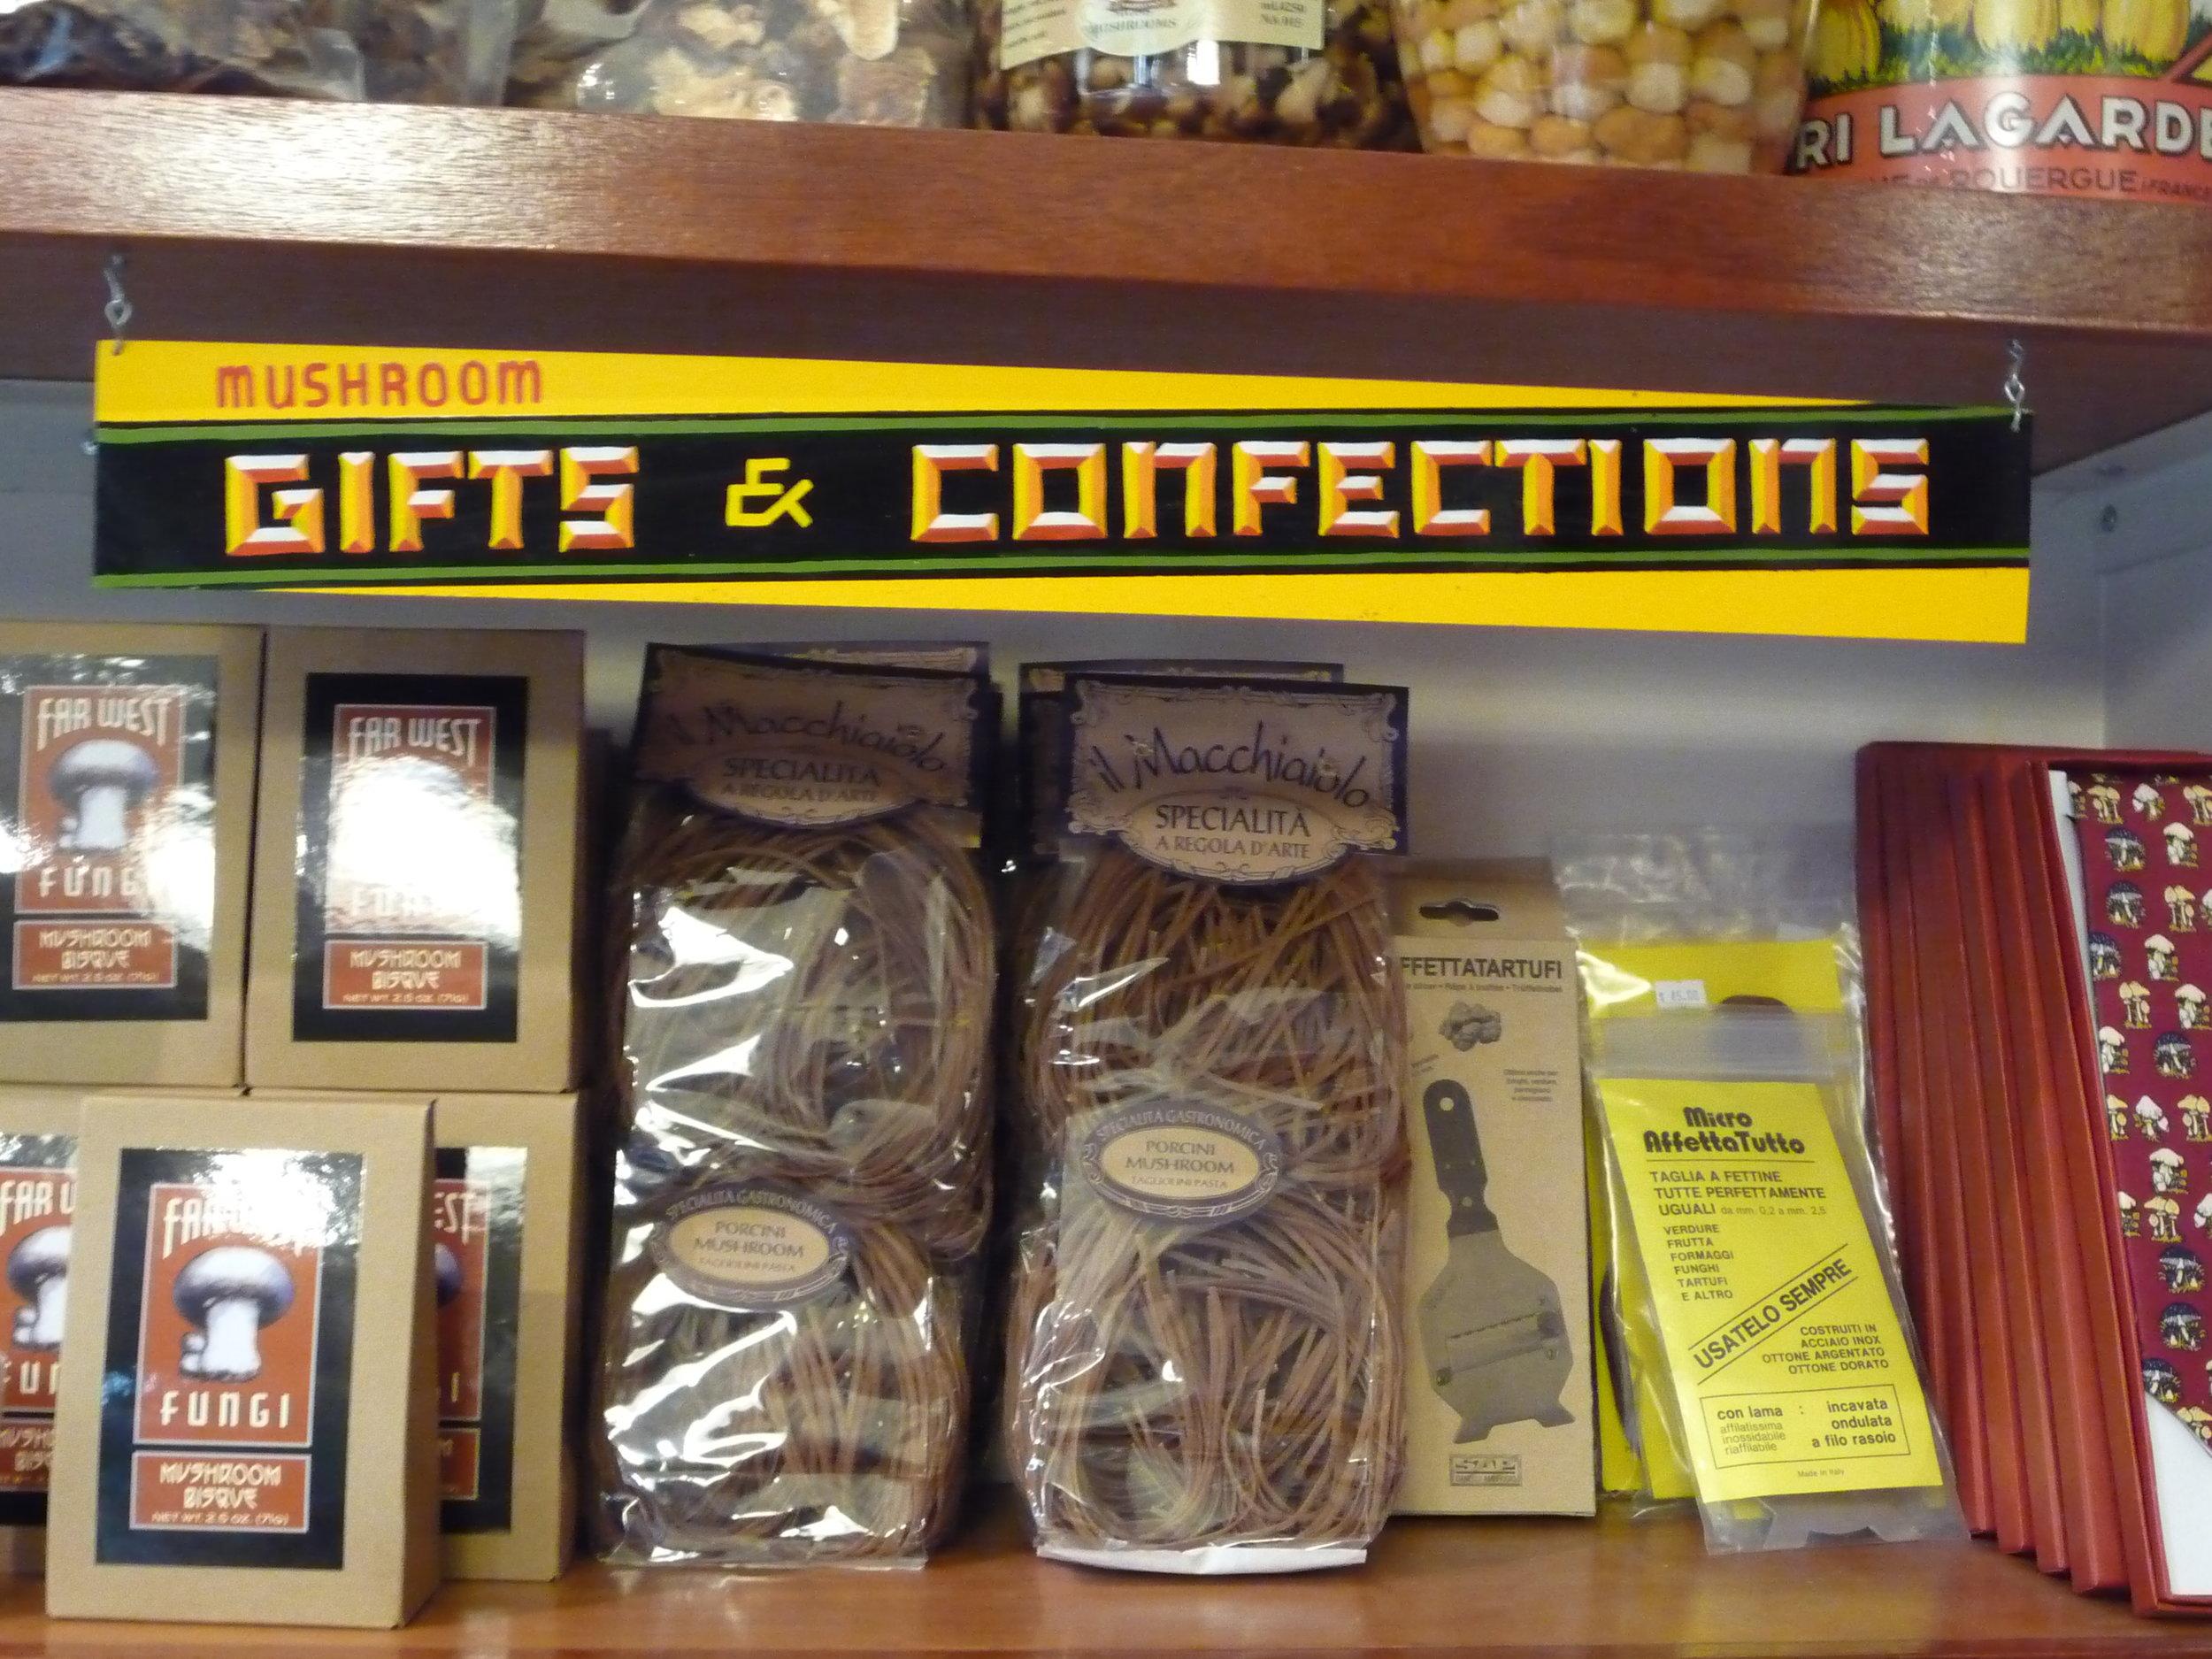 ORIG-far-west-fungi-gifts--confections-shelf-sign_4323724014_o.jpg